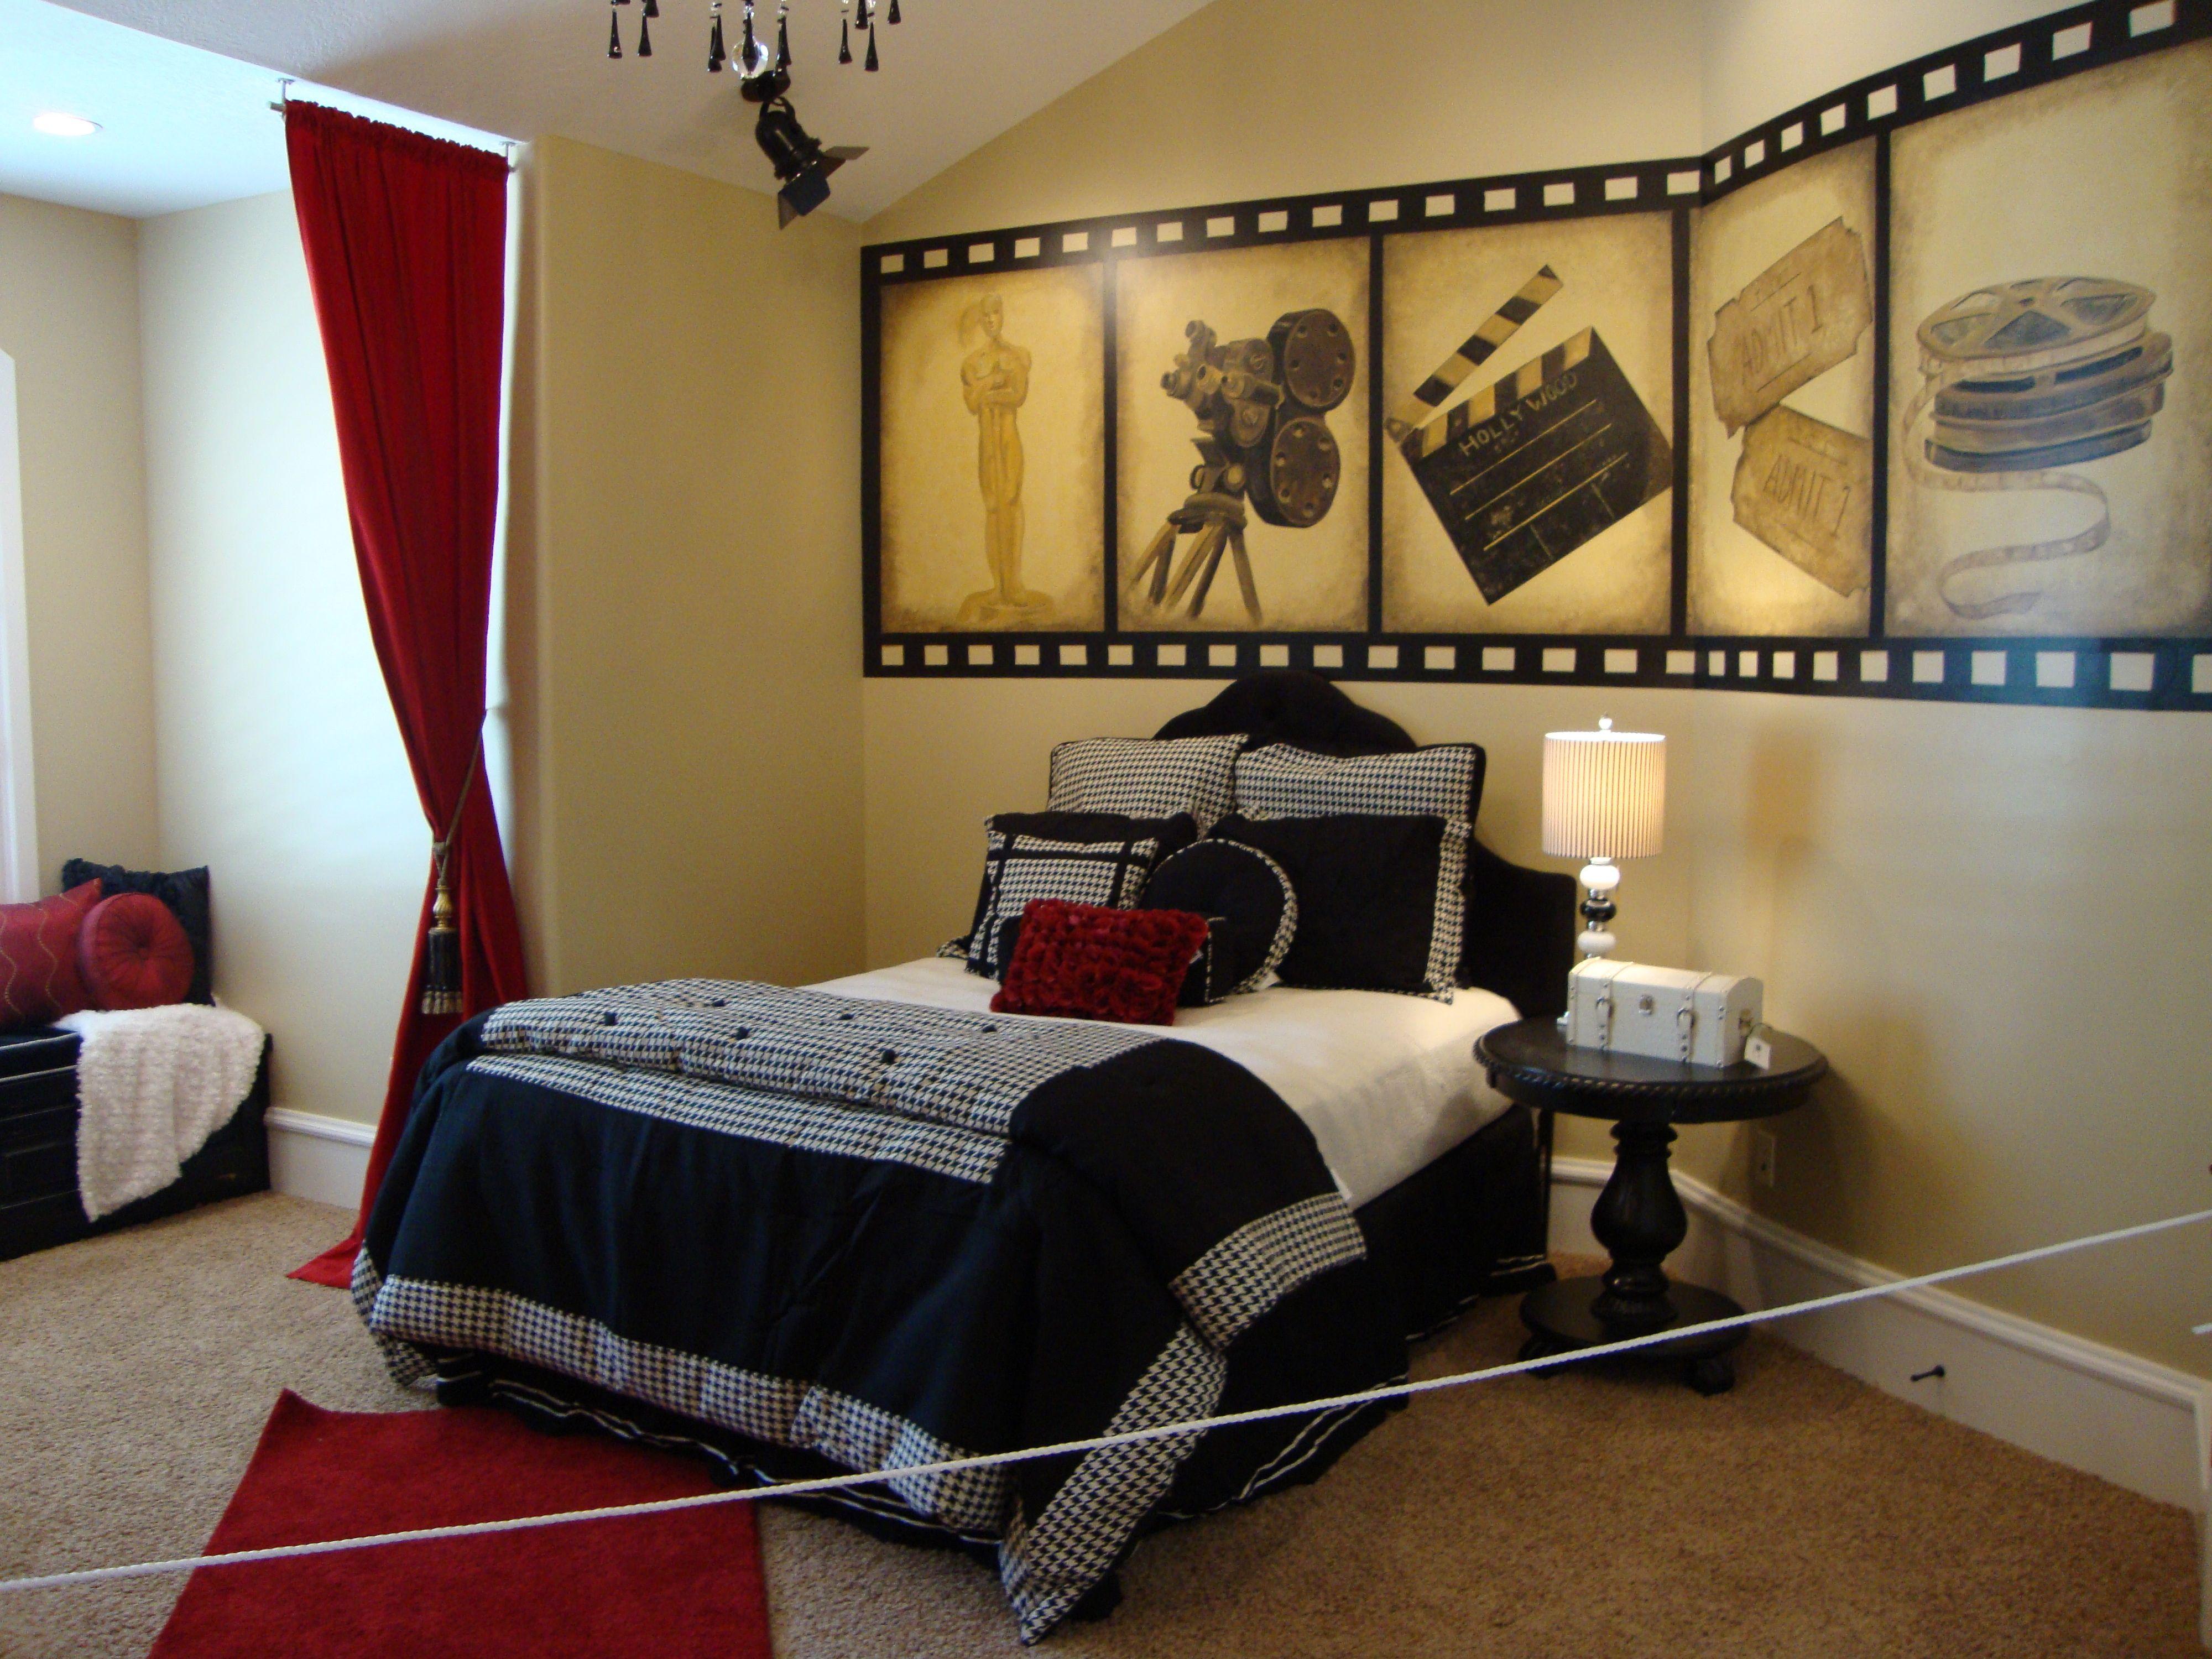 best 25+ movie themed rooms ideas on pinterest | media room decor